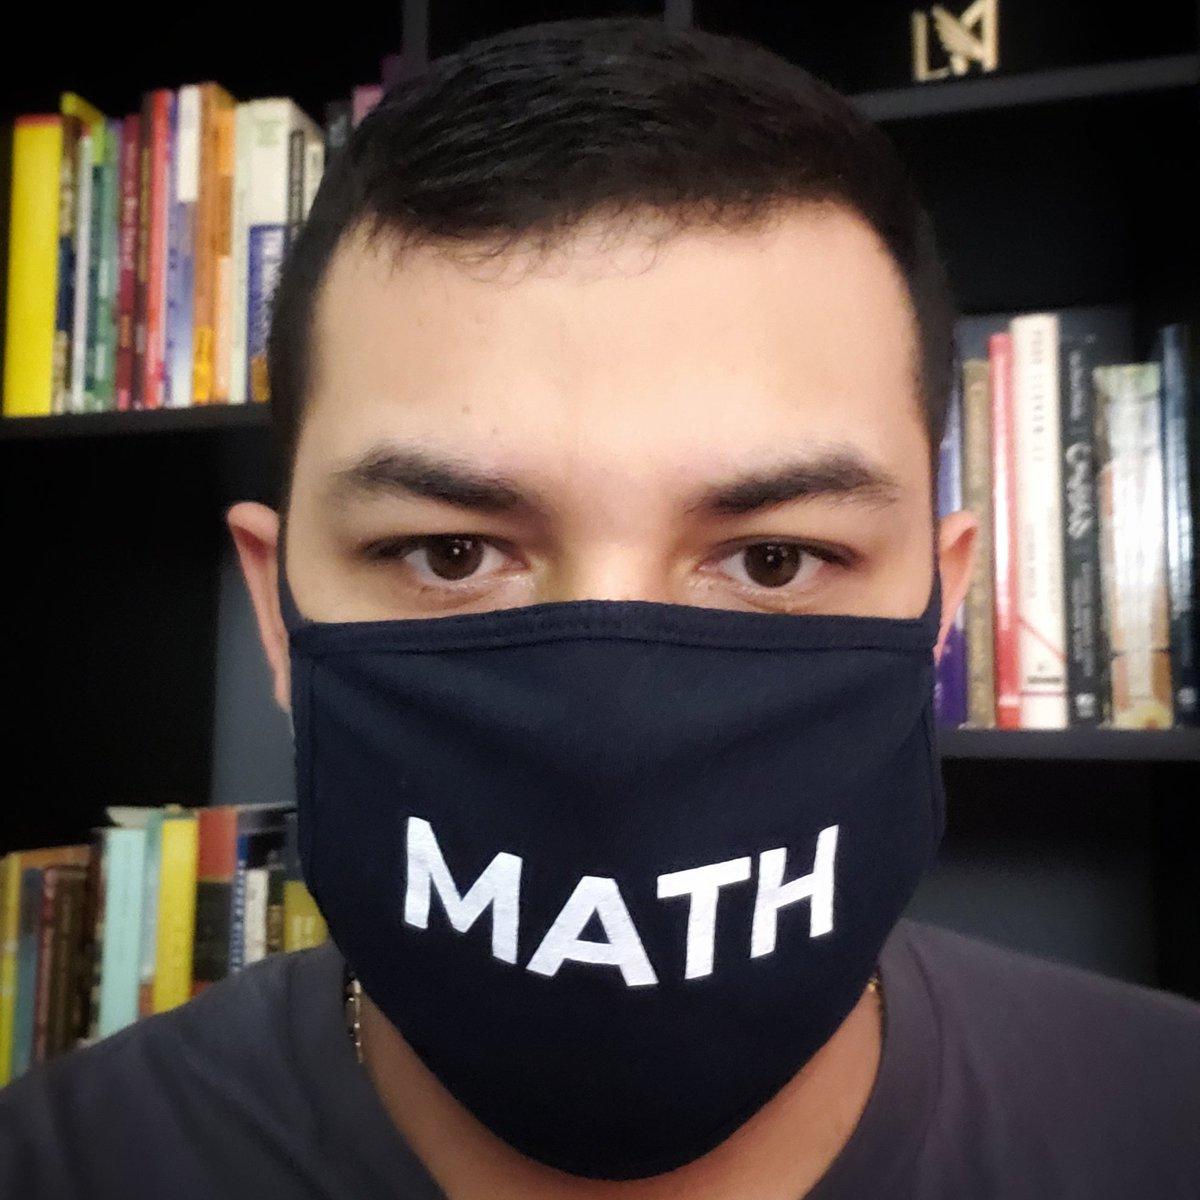 #RT @AndrewYang: RT @somberamarath: Repping the #YangGang. #wearyourmask https://t.co/ZBfc4PJRH0